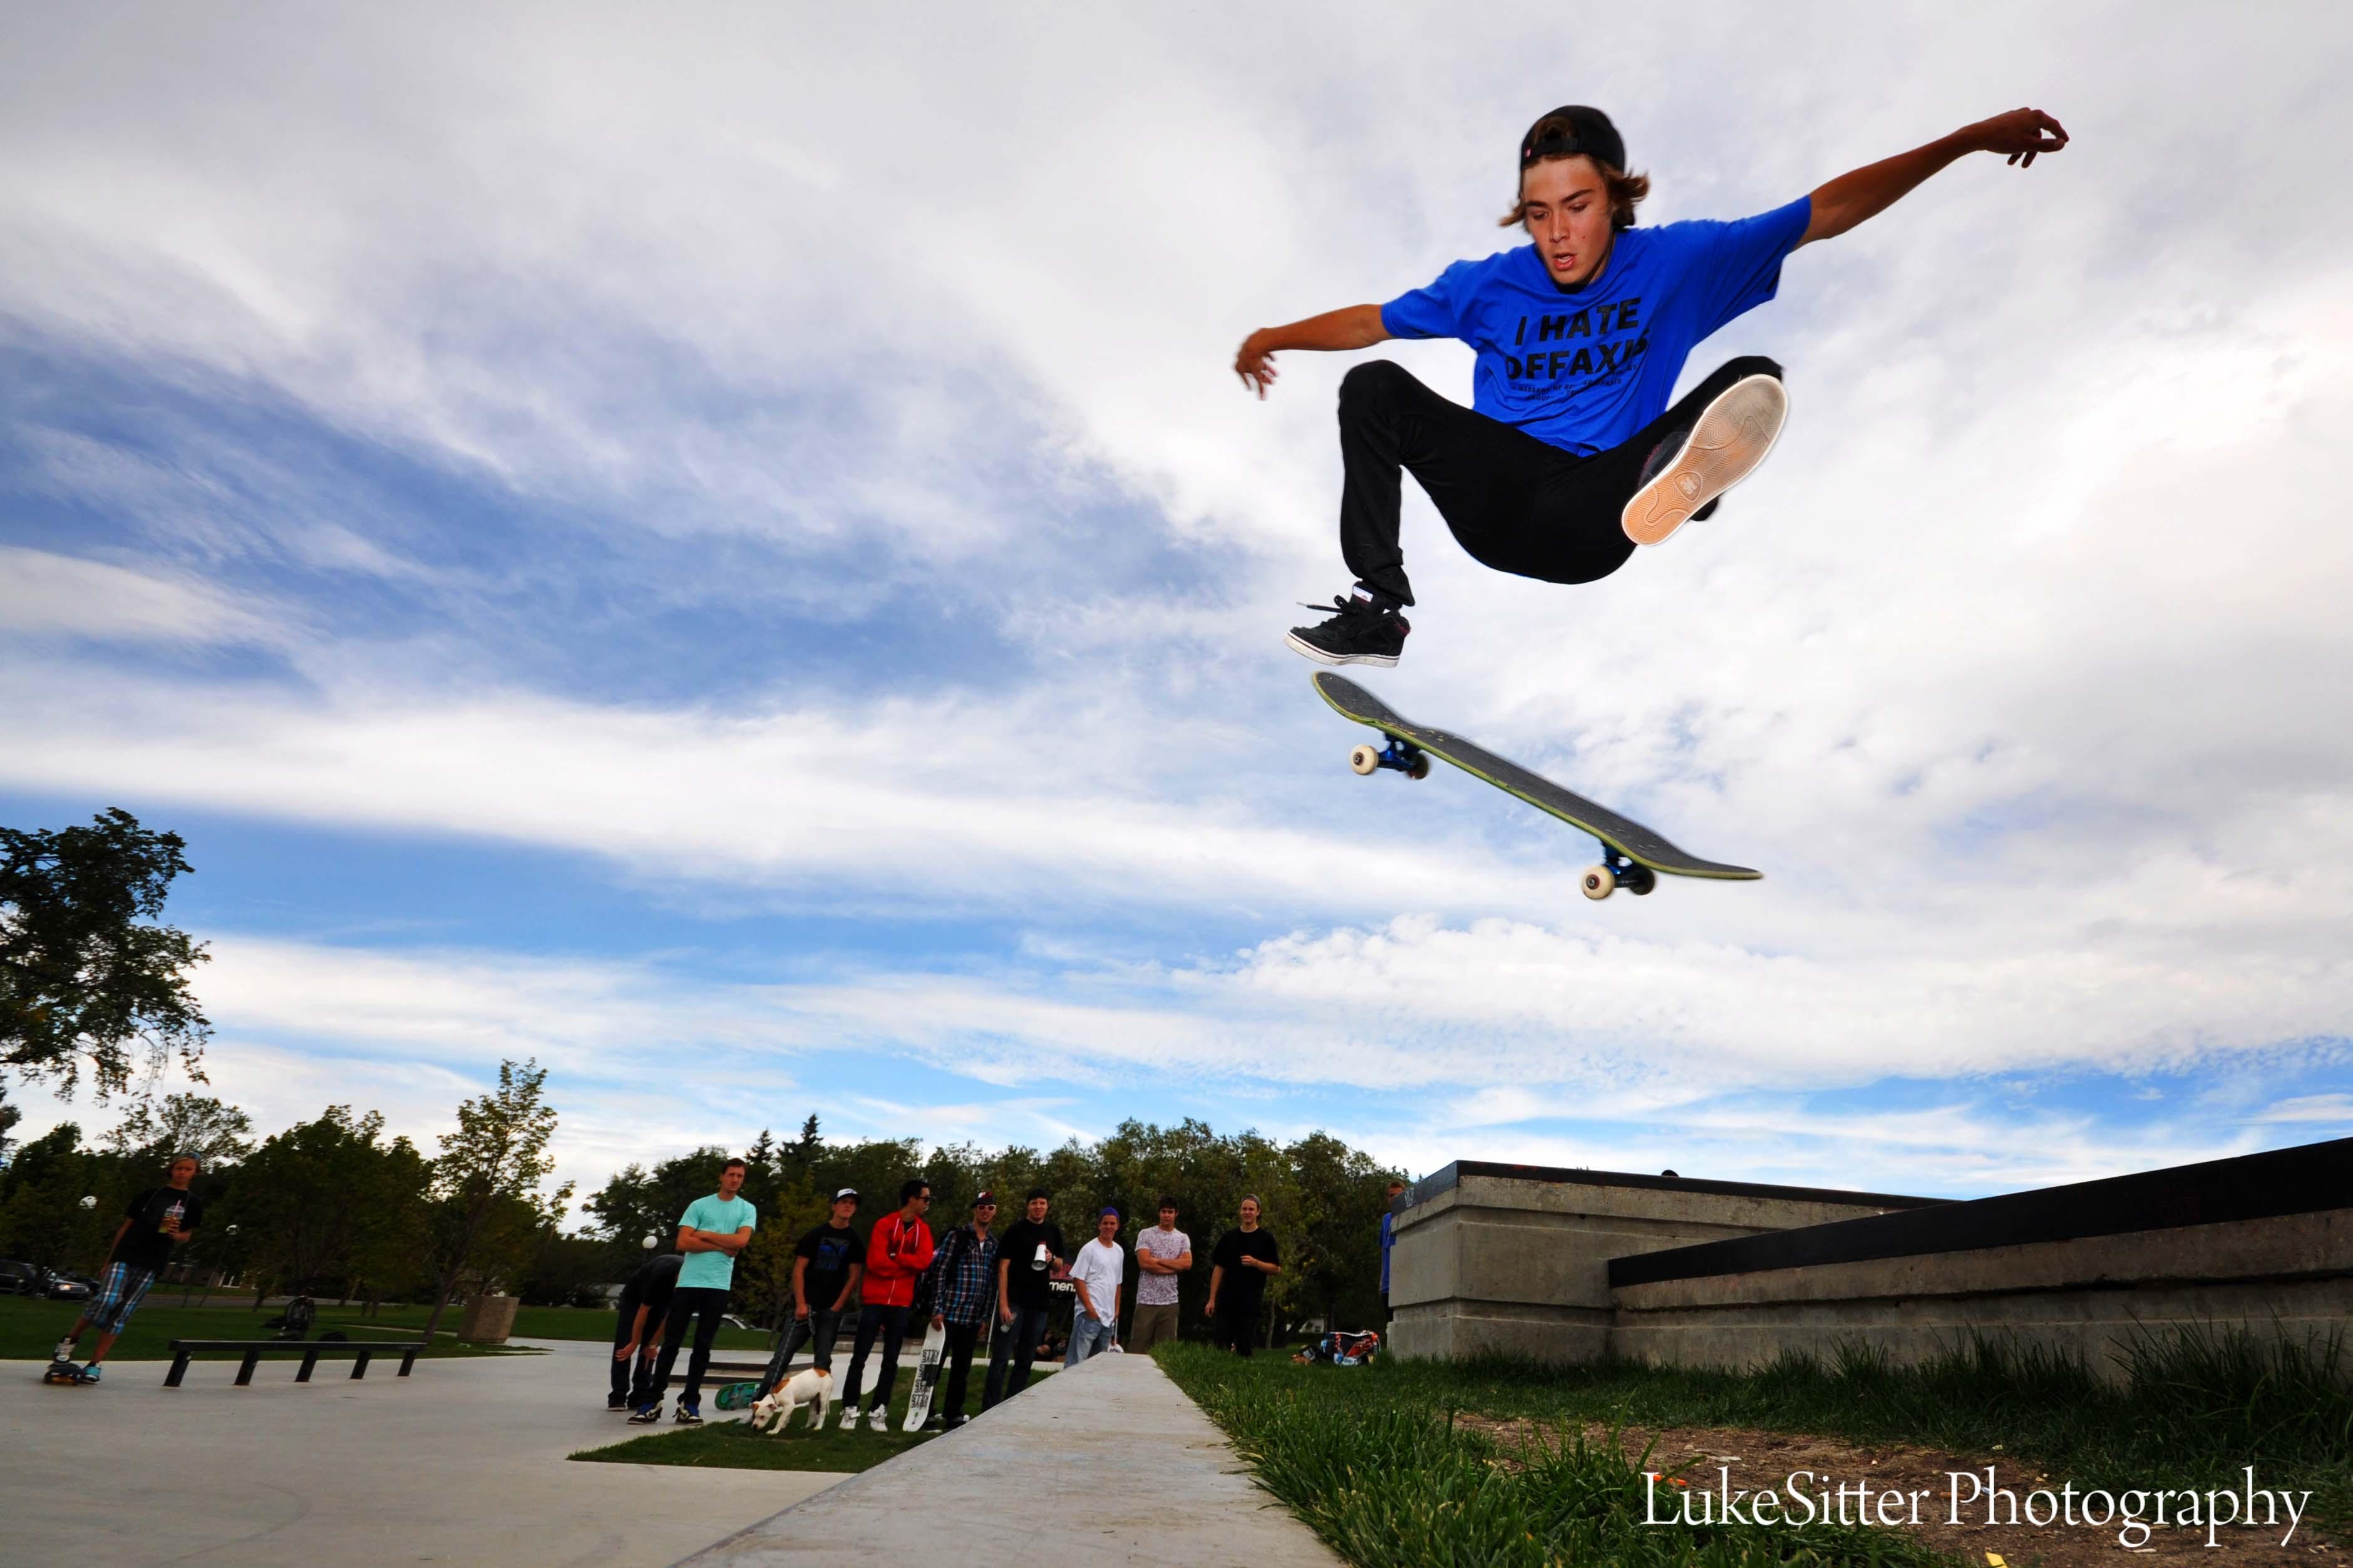 Sickest Skateboard Tricks